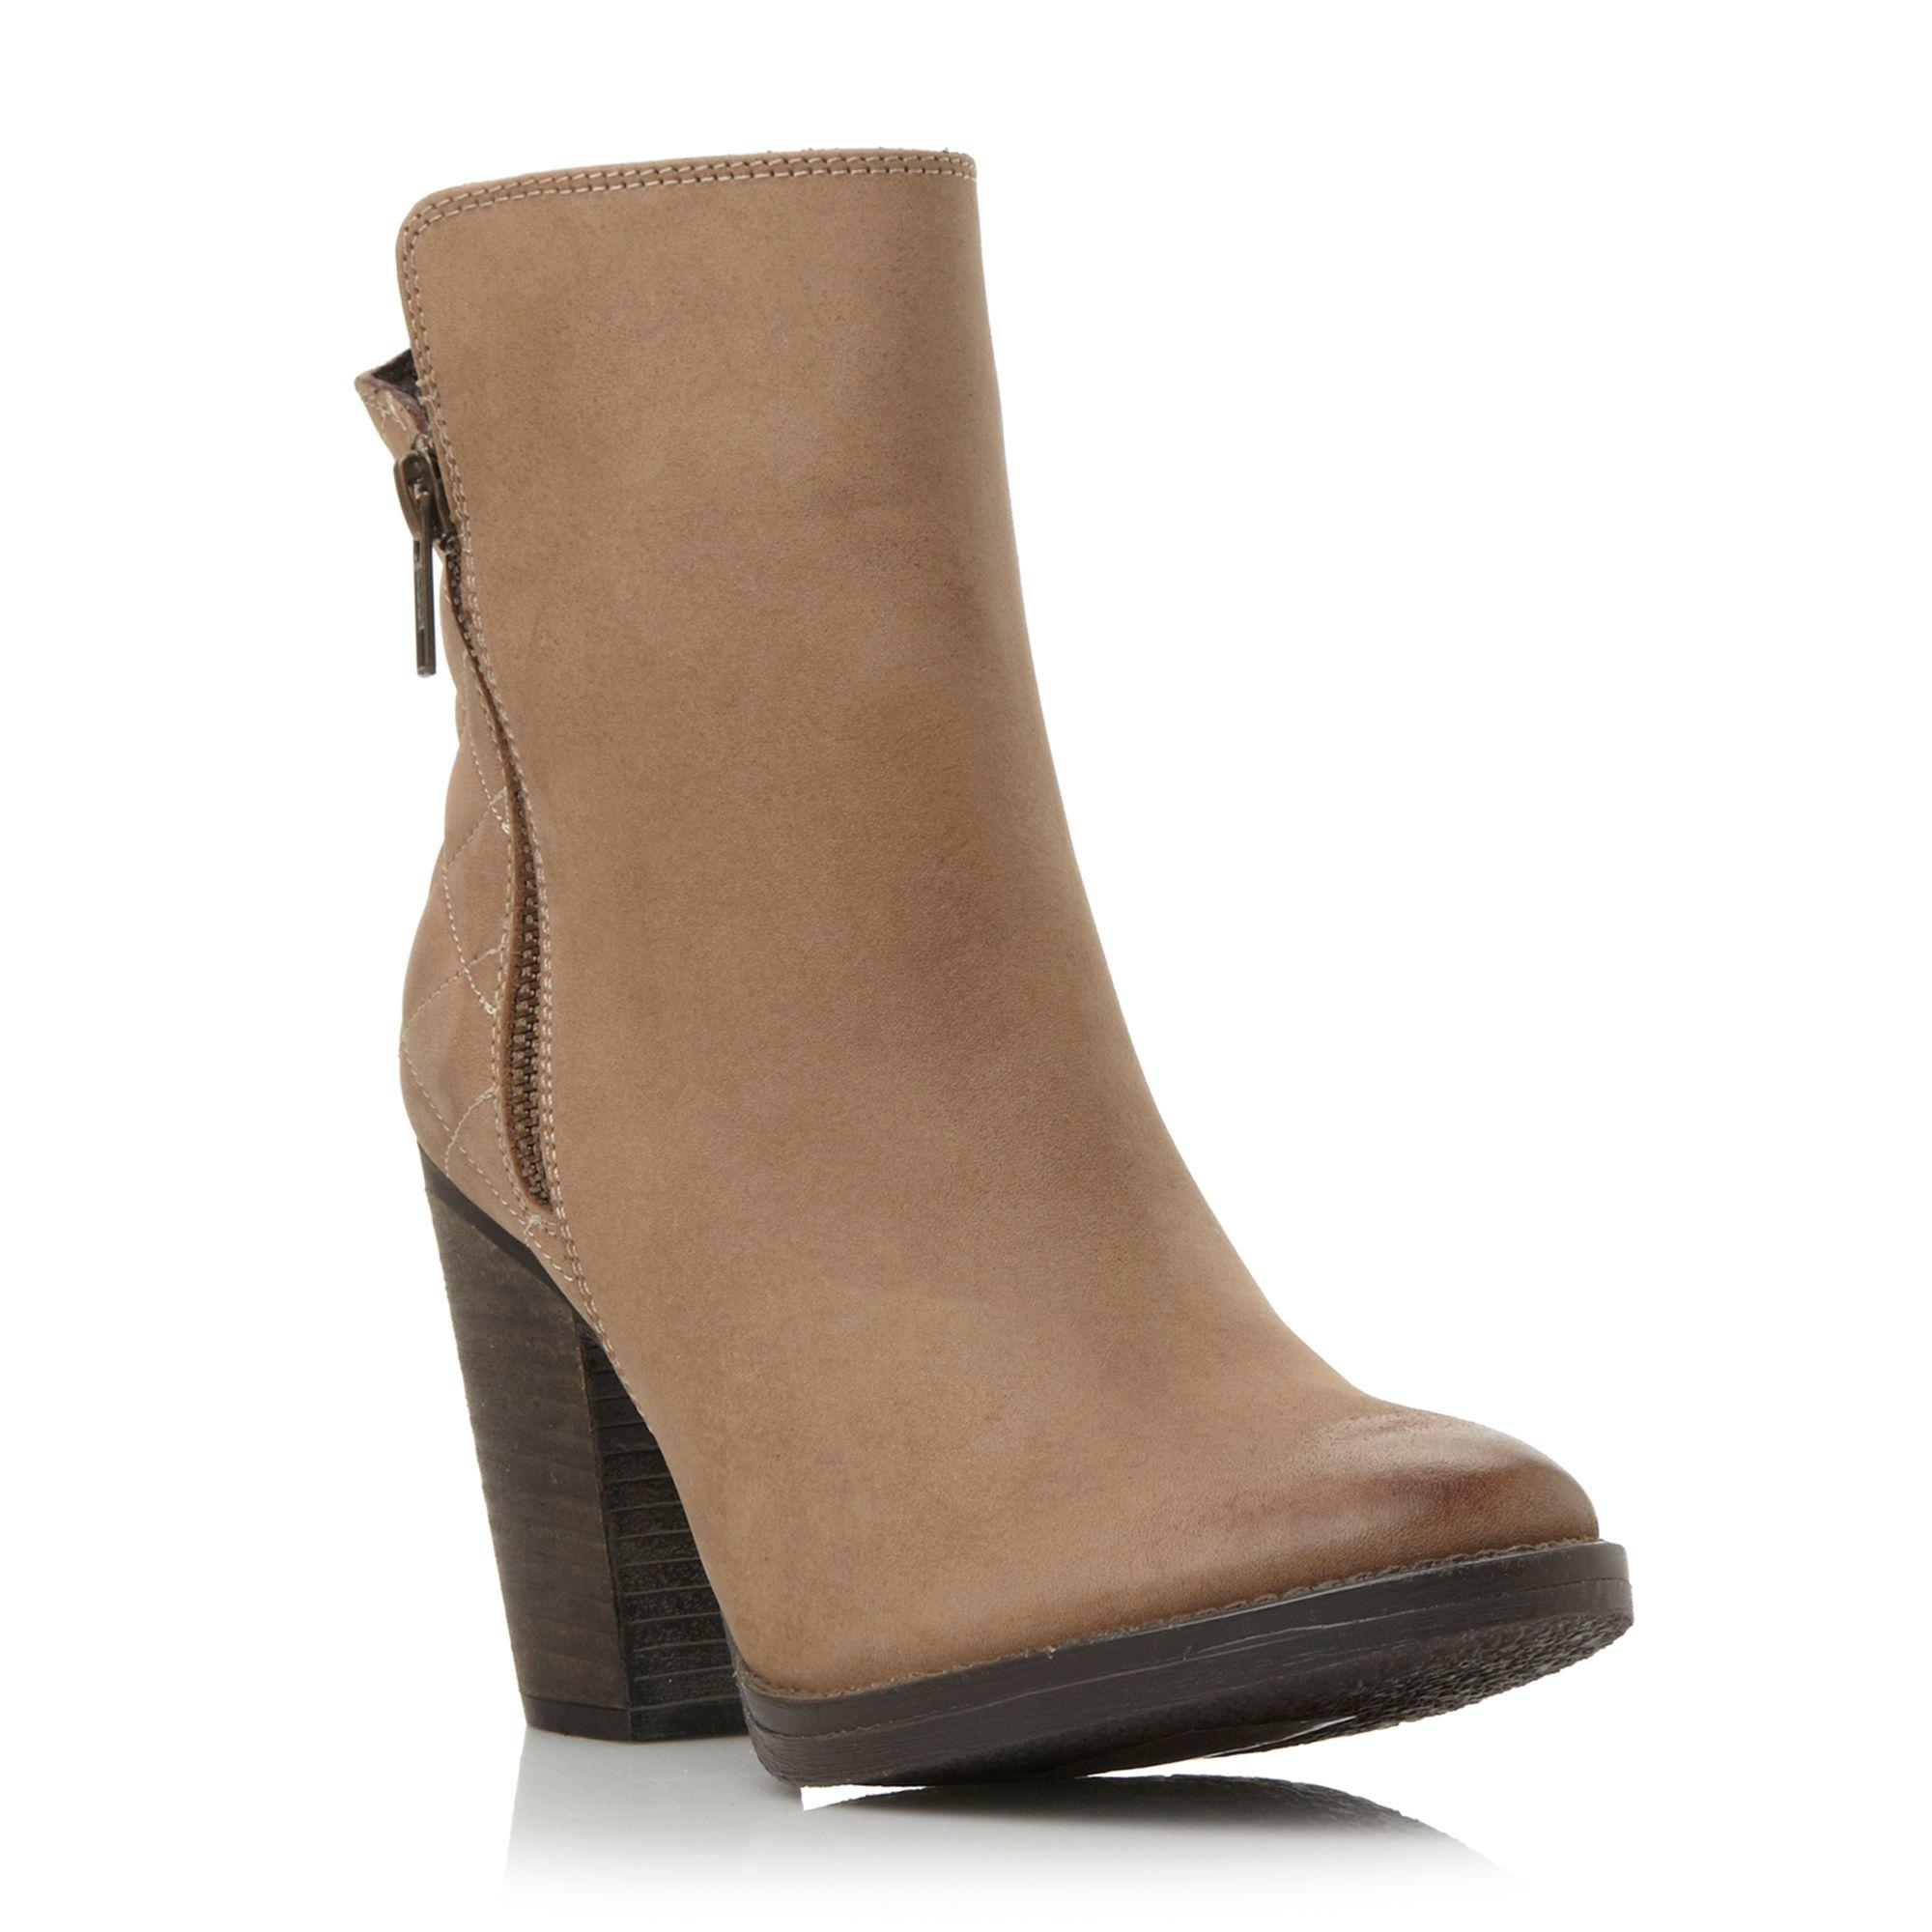 Sophia Webster Snow Boots